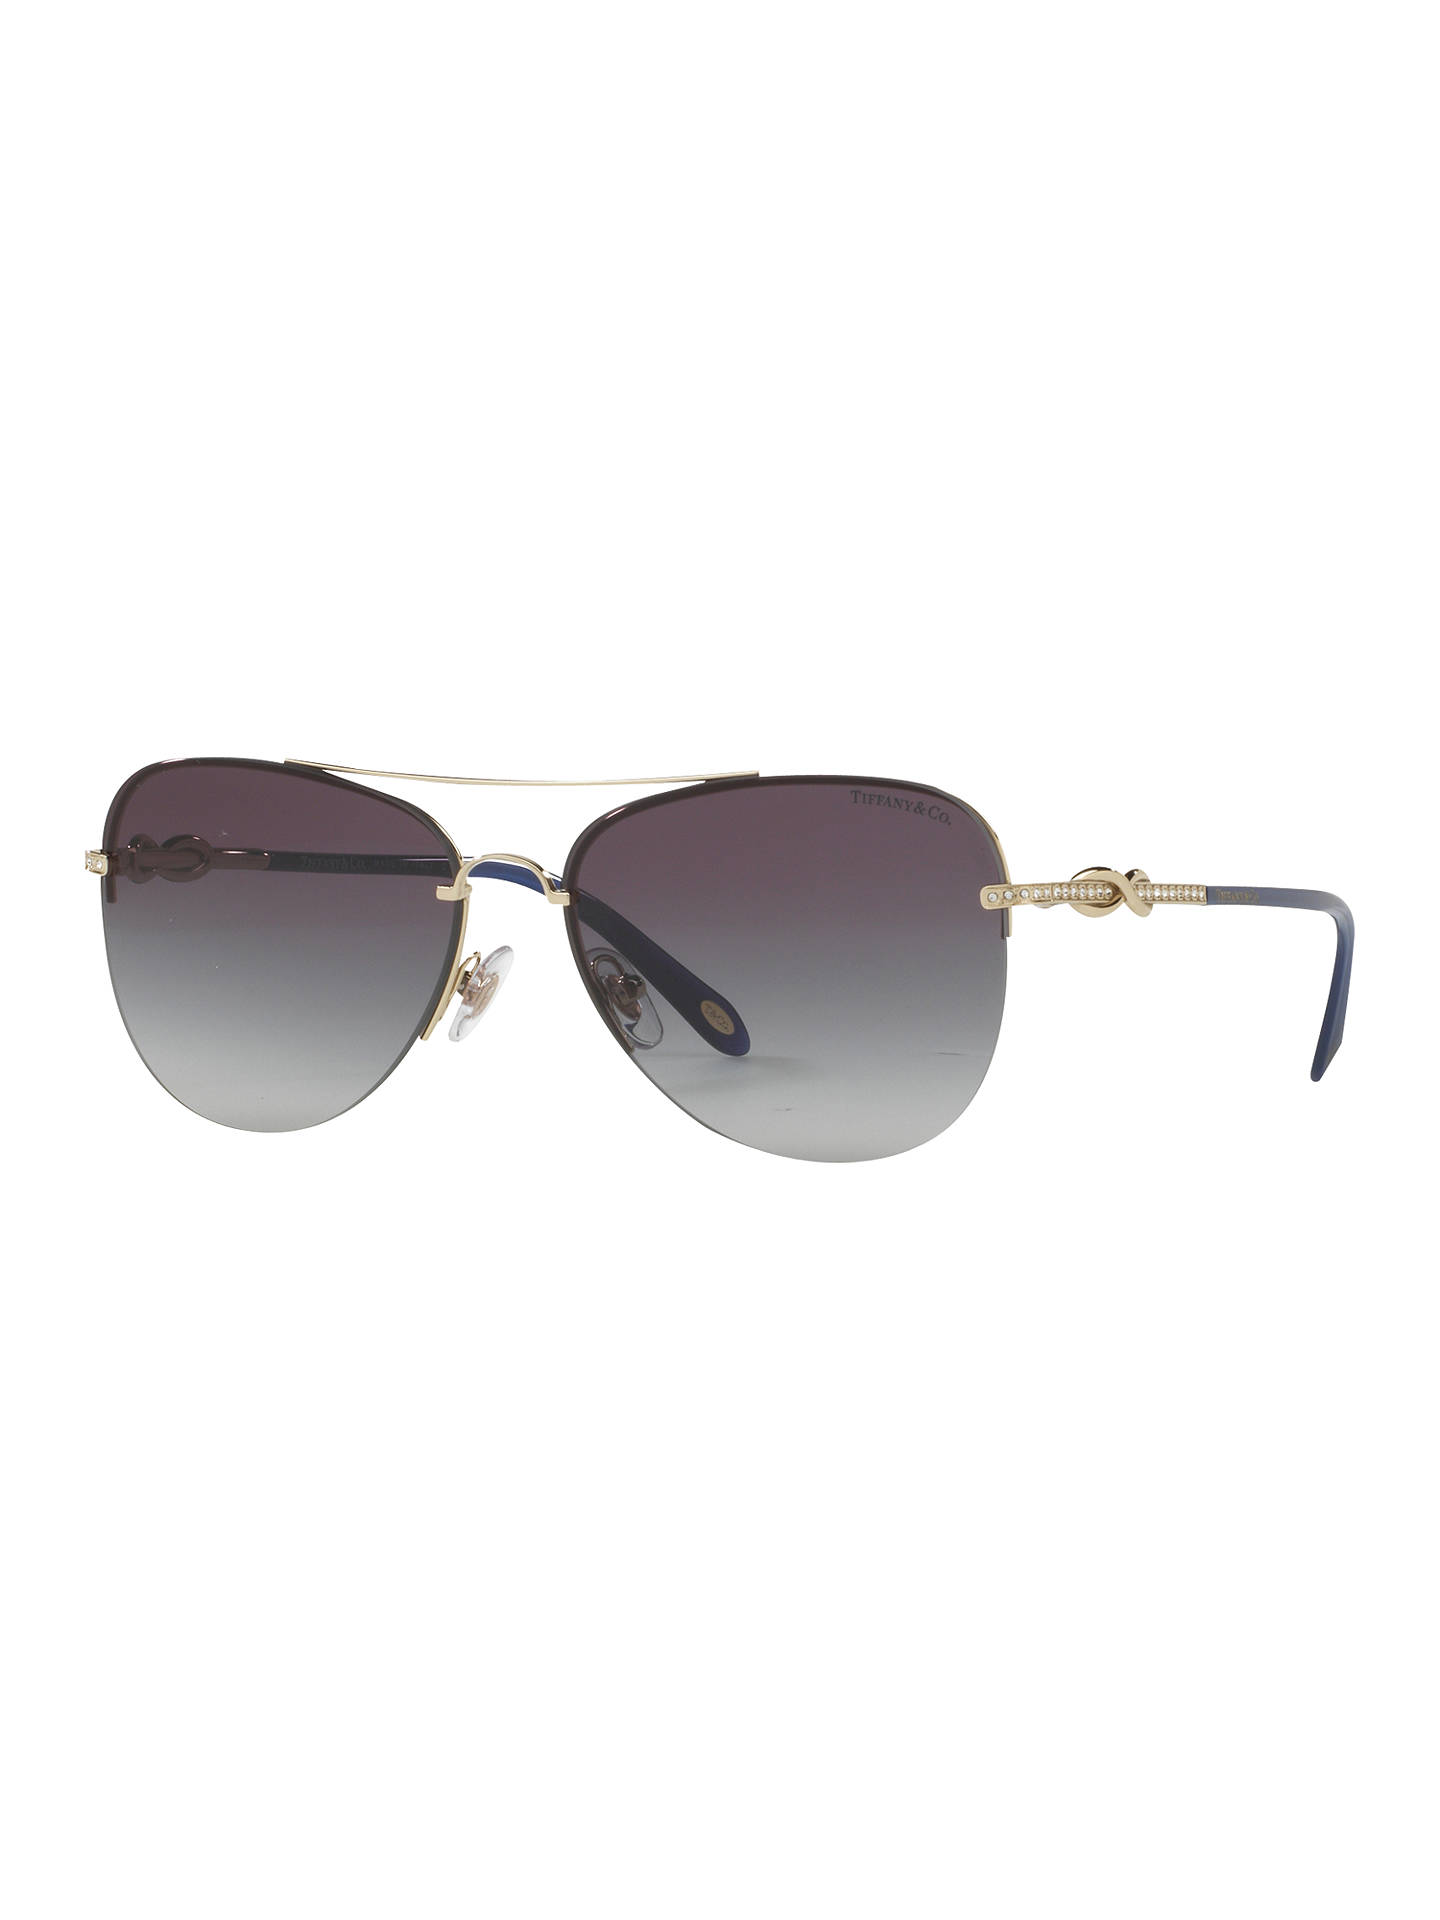 d01eb8bd020c Tiffany   Co TF3054B Embellished Aviator Sunglasses at John Lewis ...